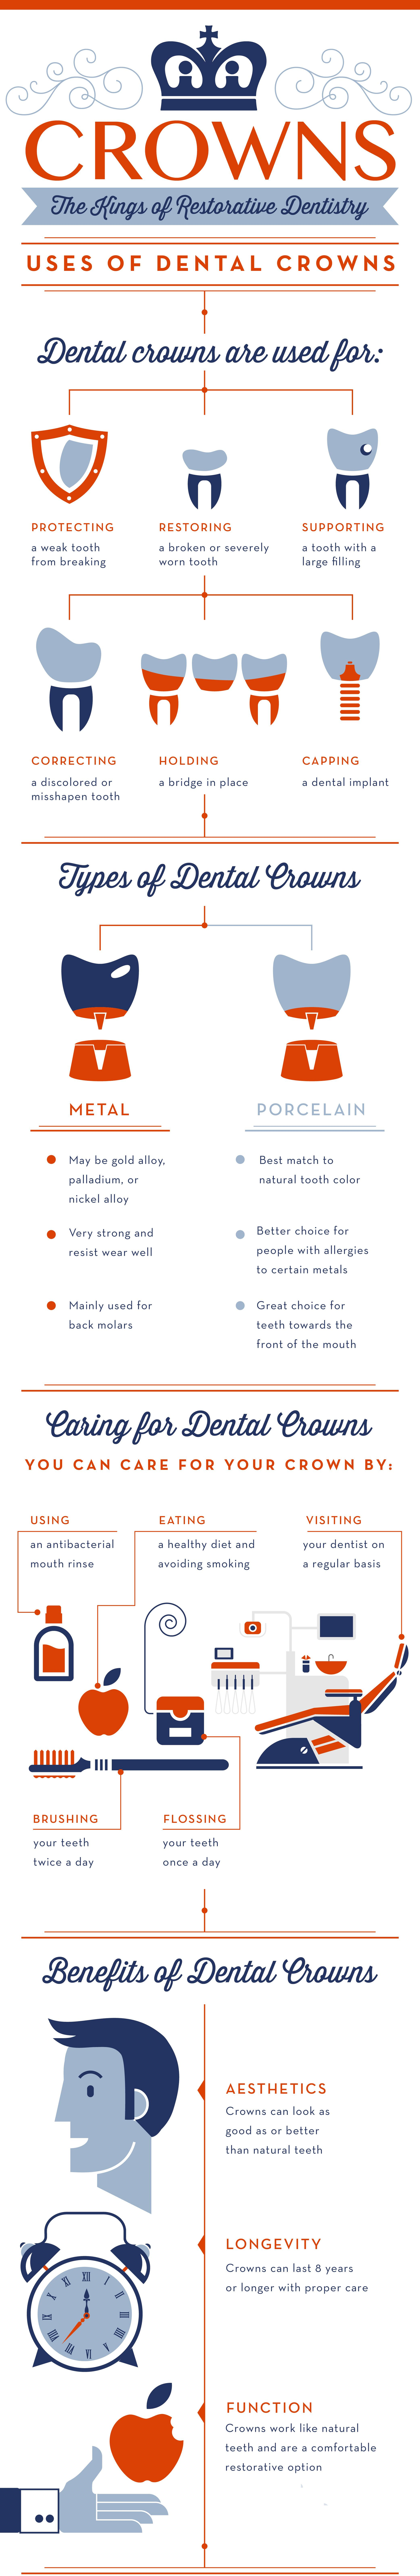 Crowns - the kings of restorative dentistry!